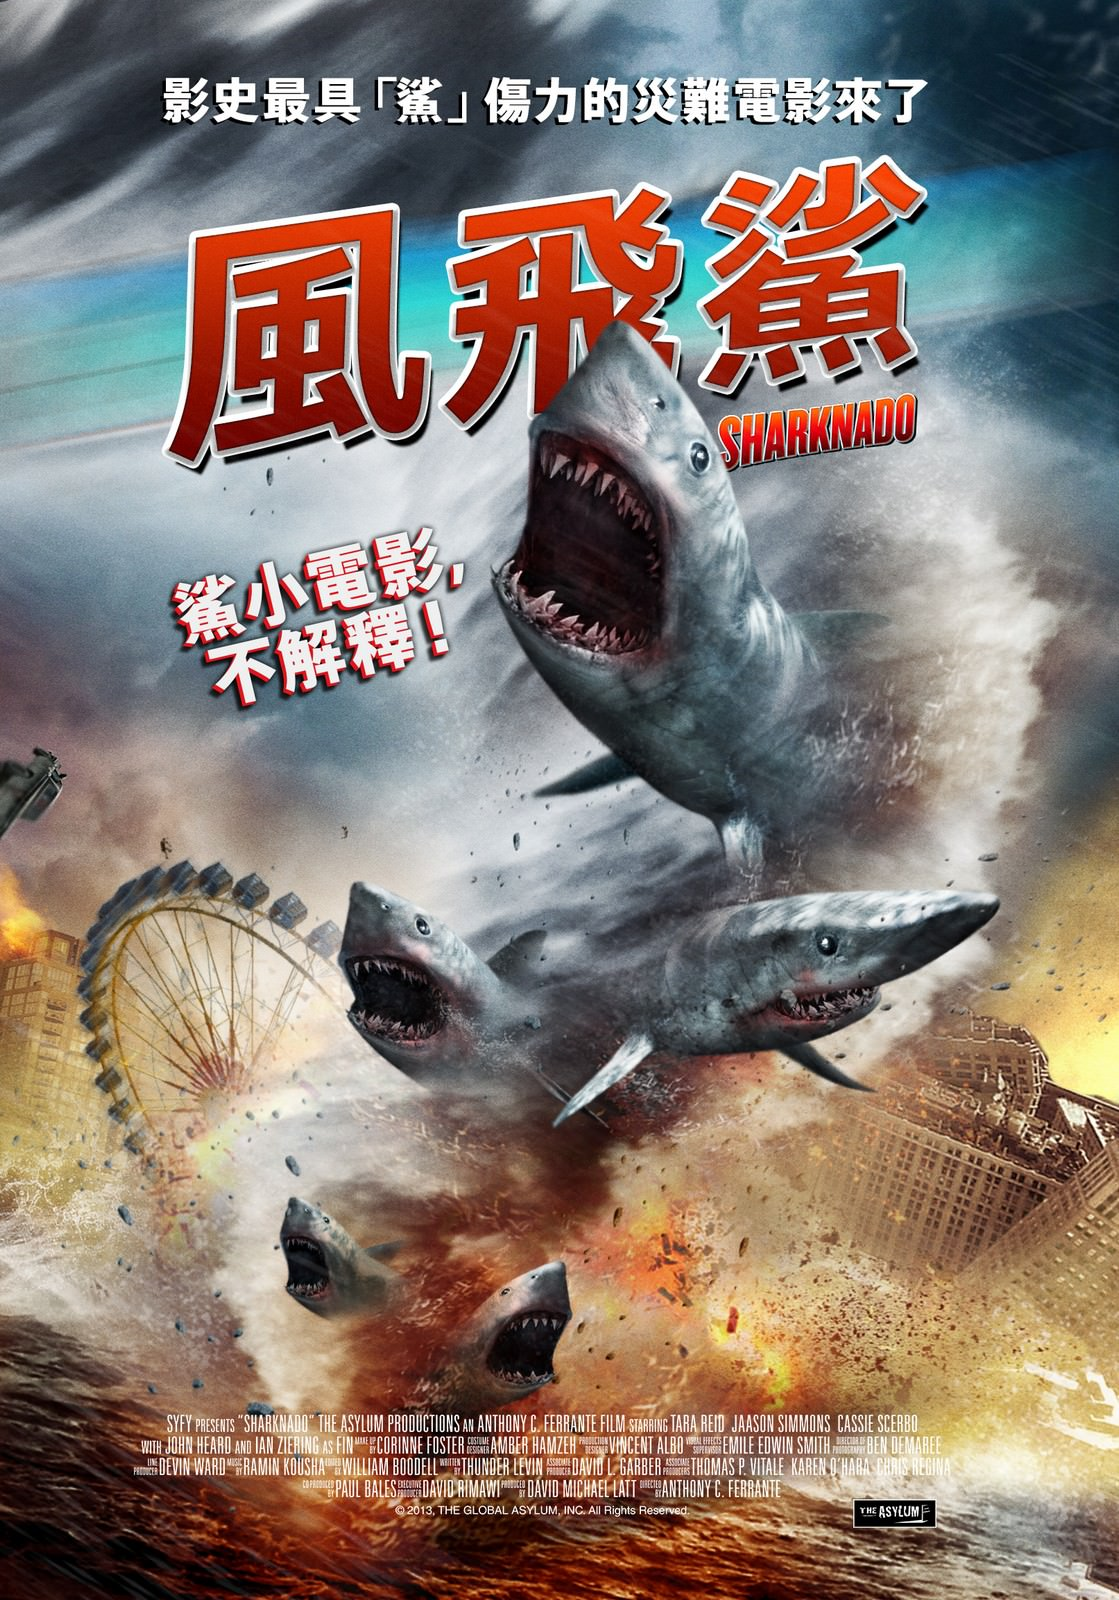 Movie, Sharknado(美國) / 風飛鯊(台) / 鲨卷风(網), 電影海報, 台灣